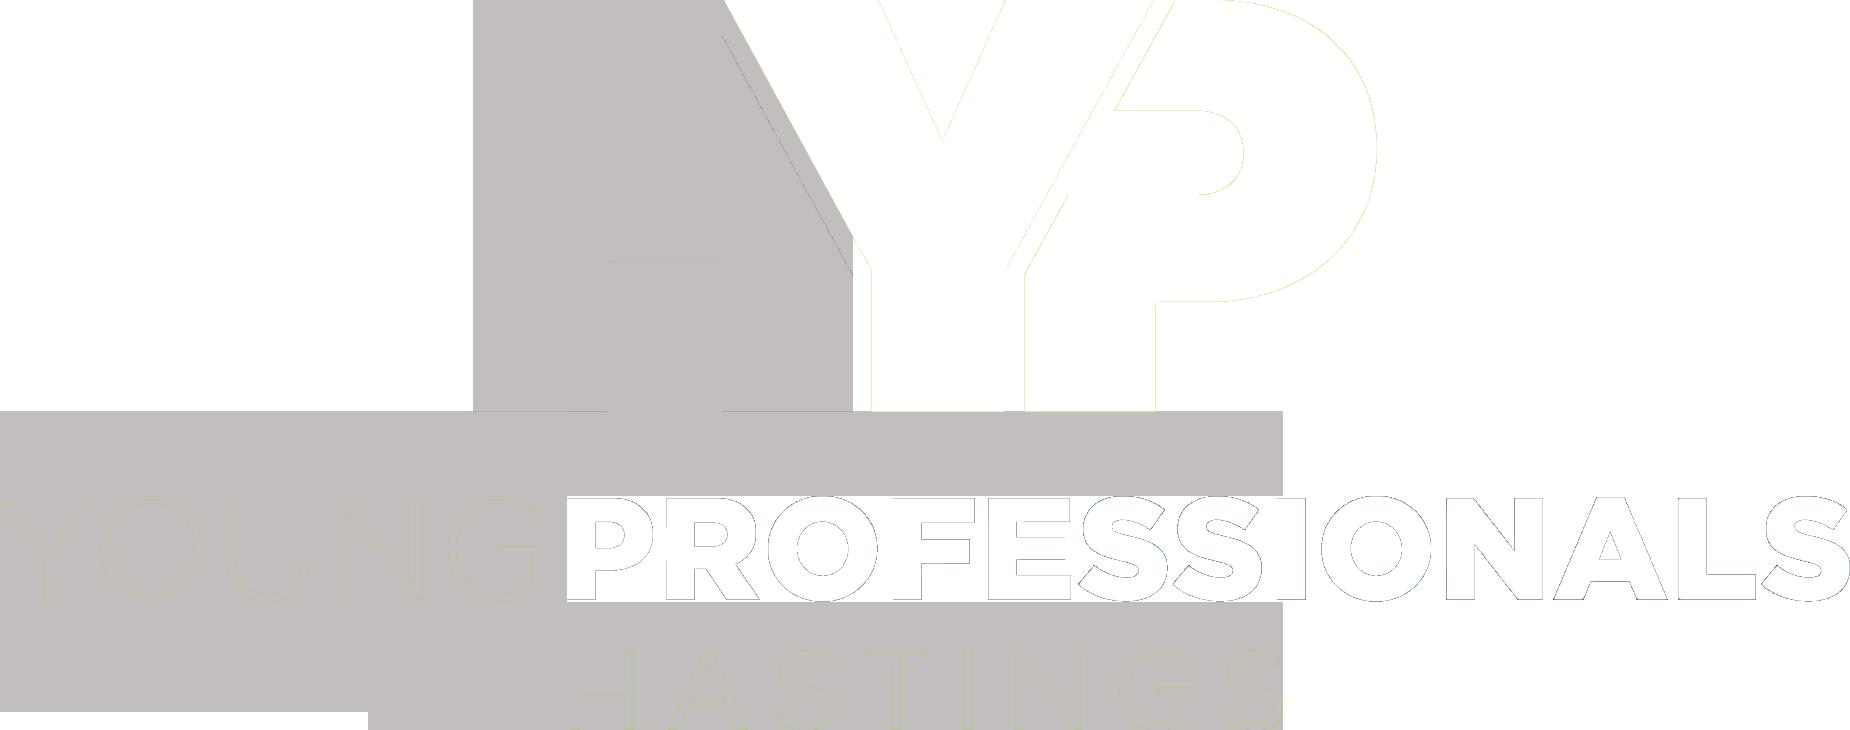 HYP_vert_bw.png